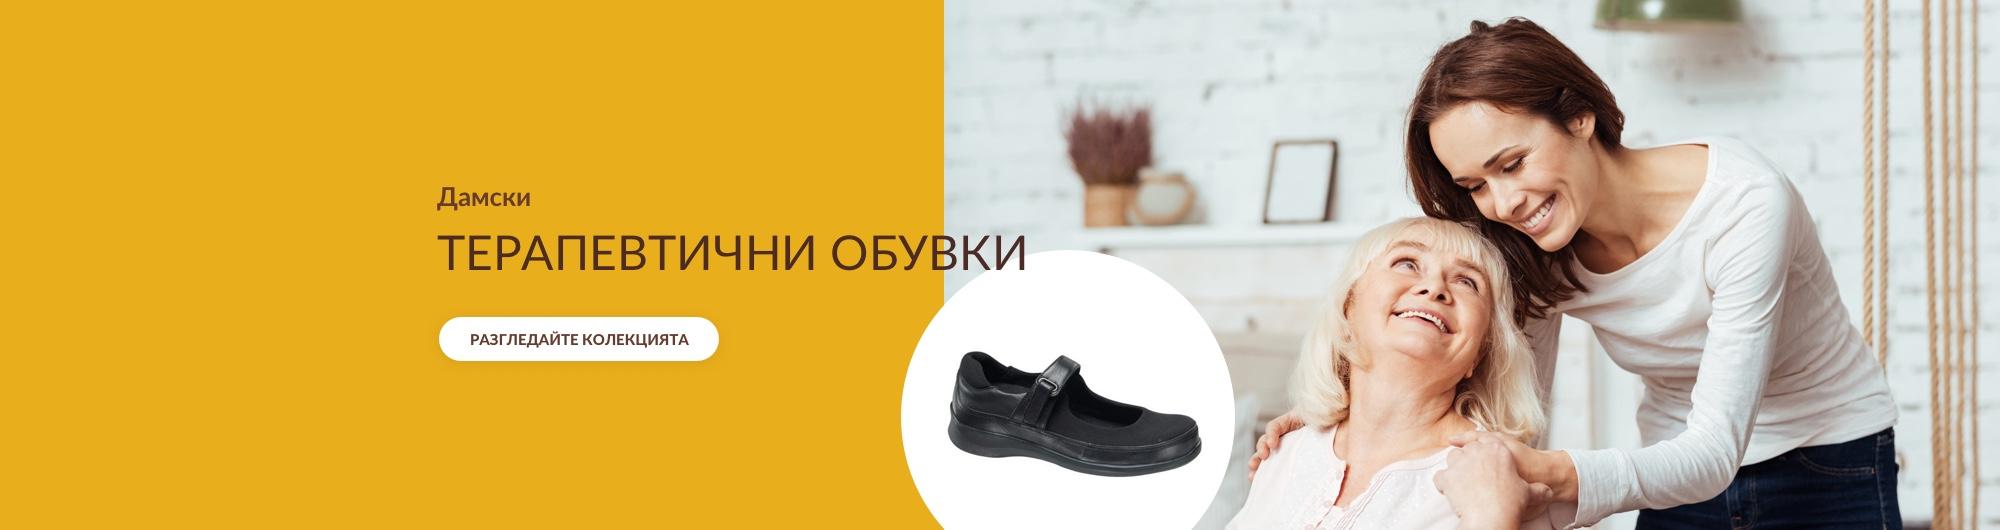 дамски терапевтични обувки